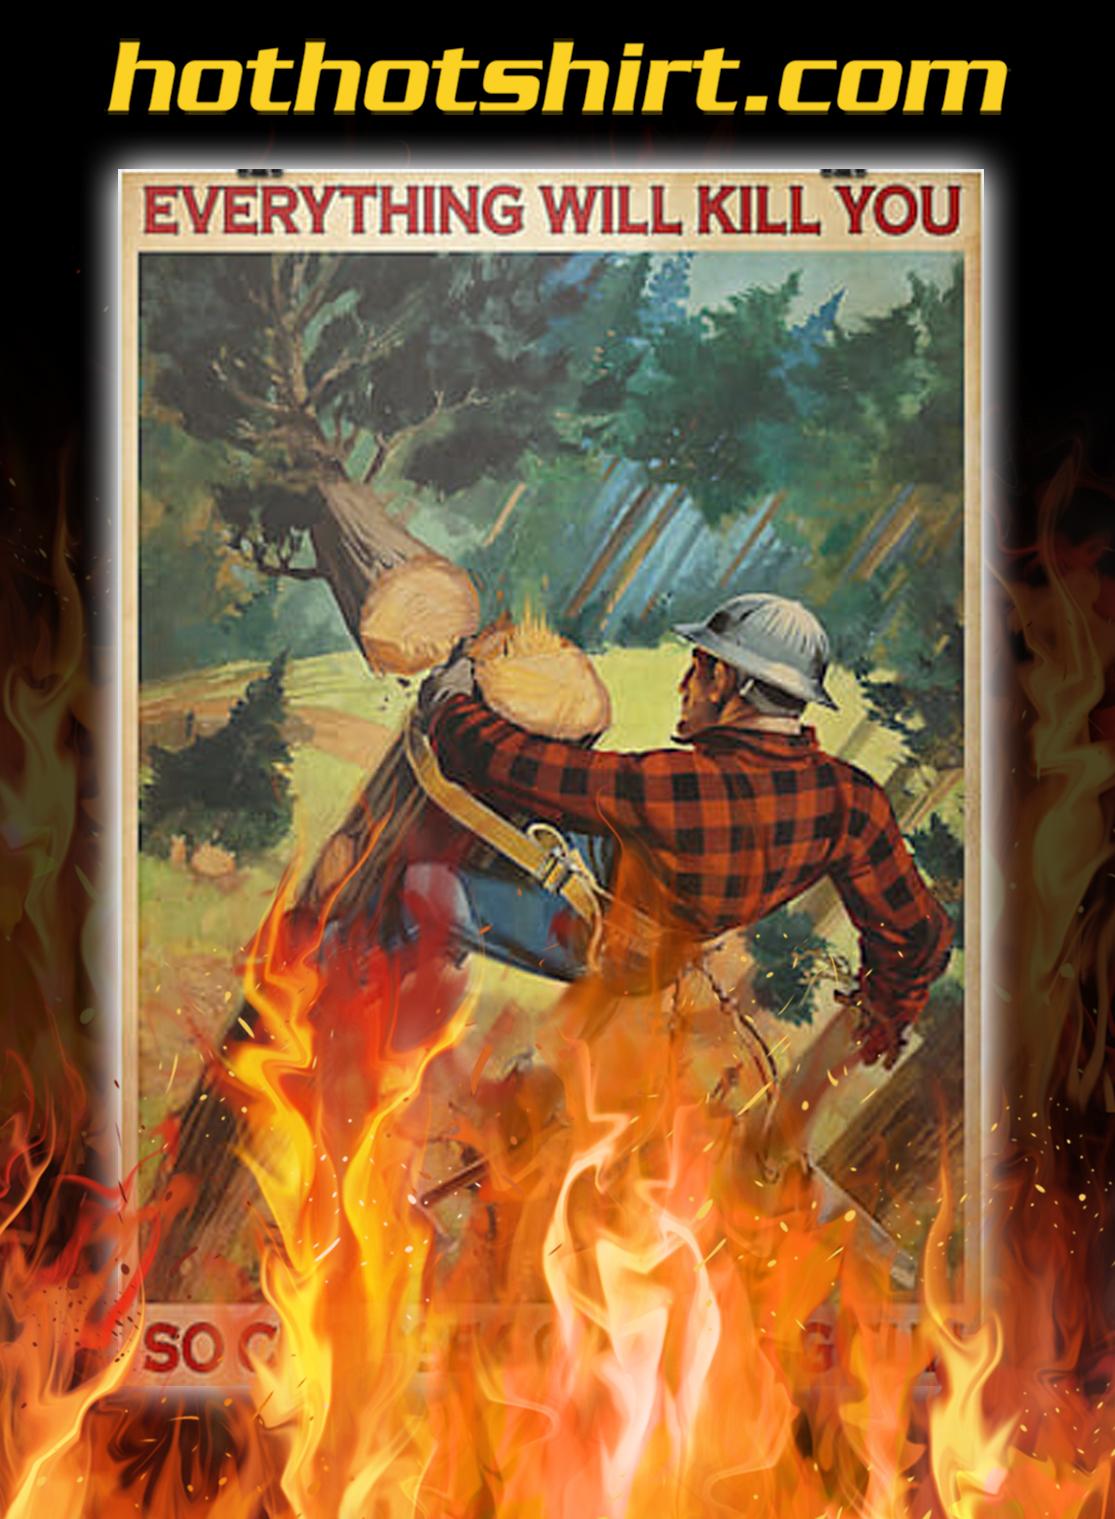 Lumberman everything will kill you so choose something fun poster - A4